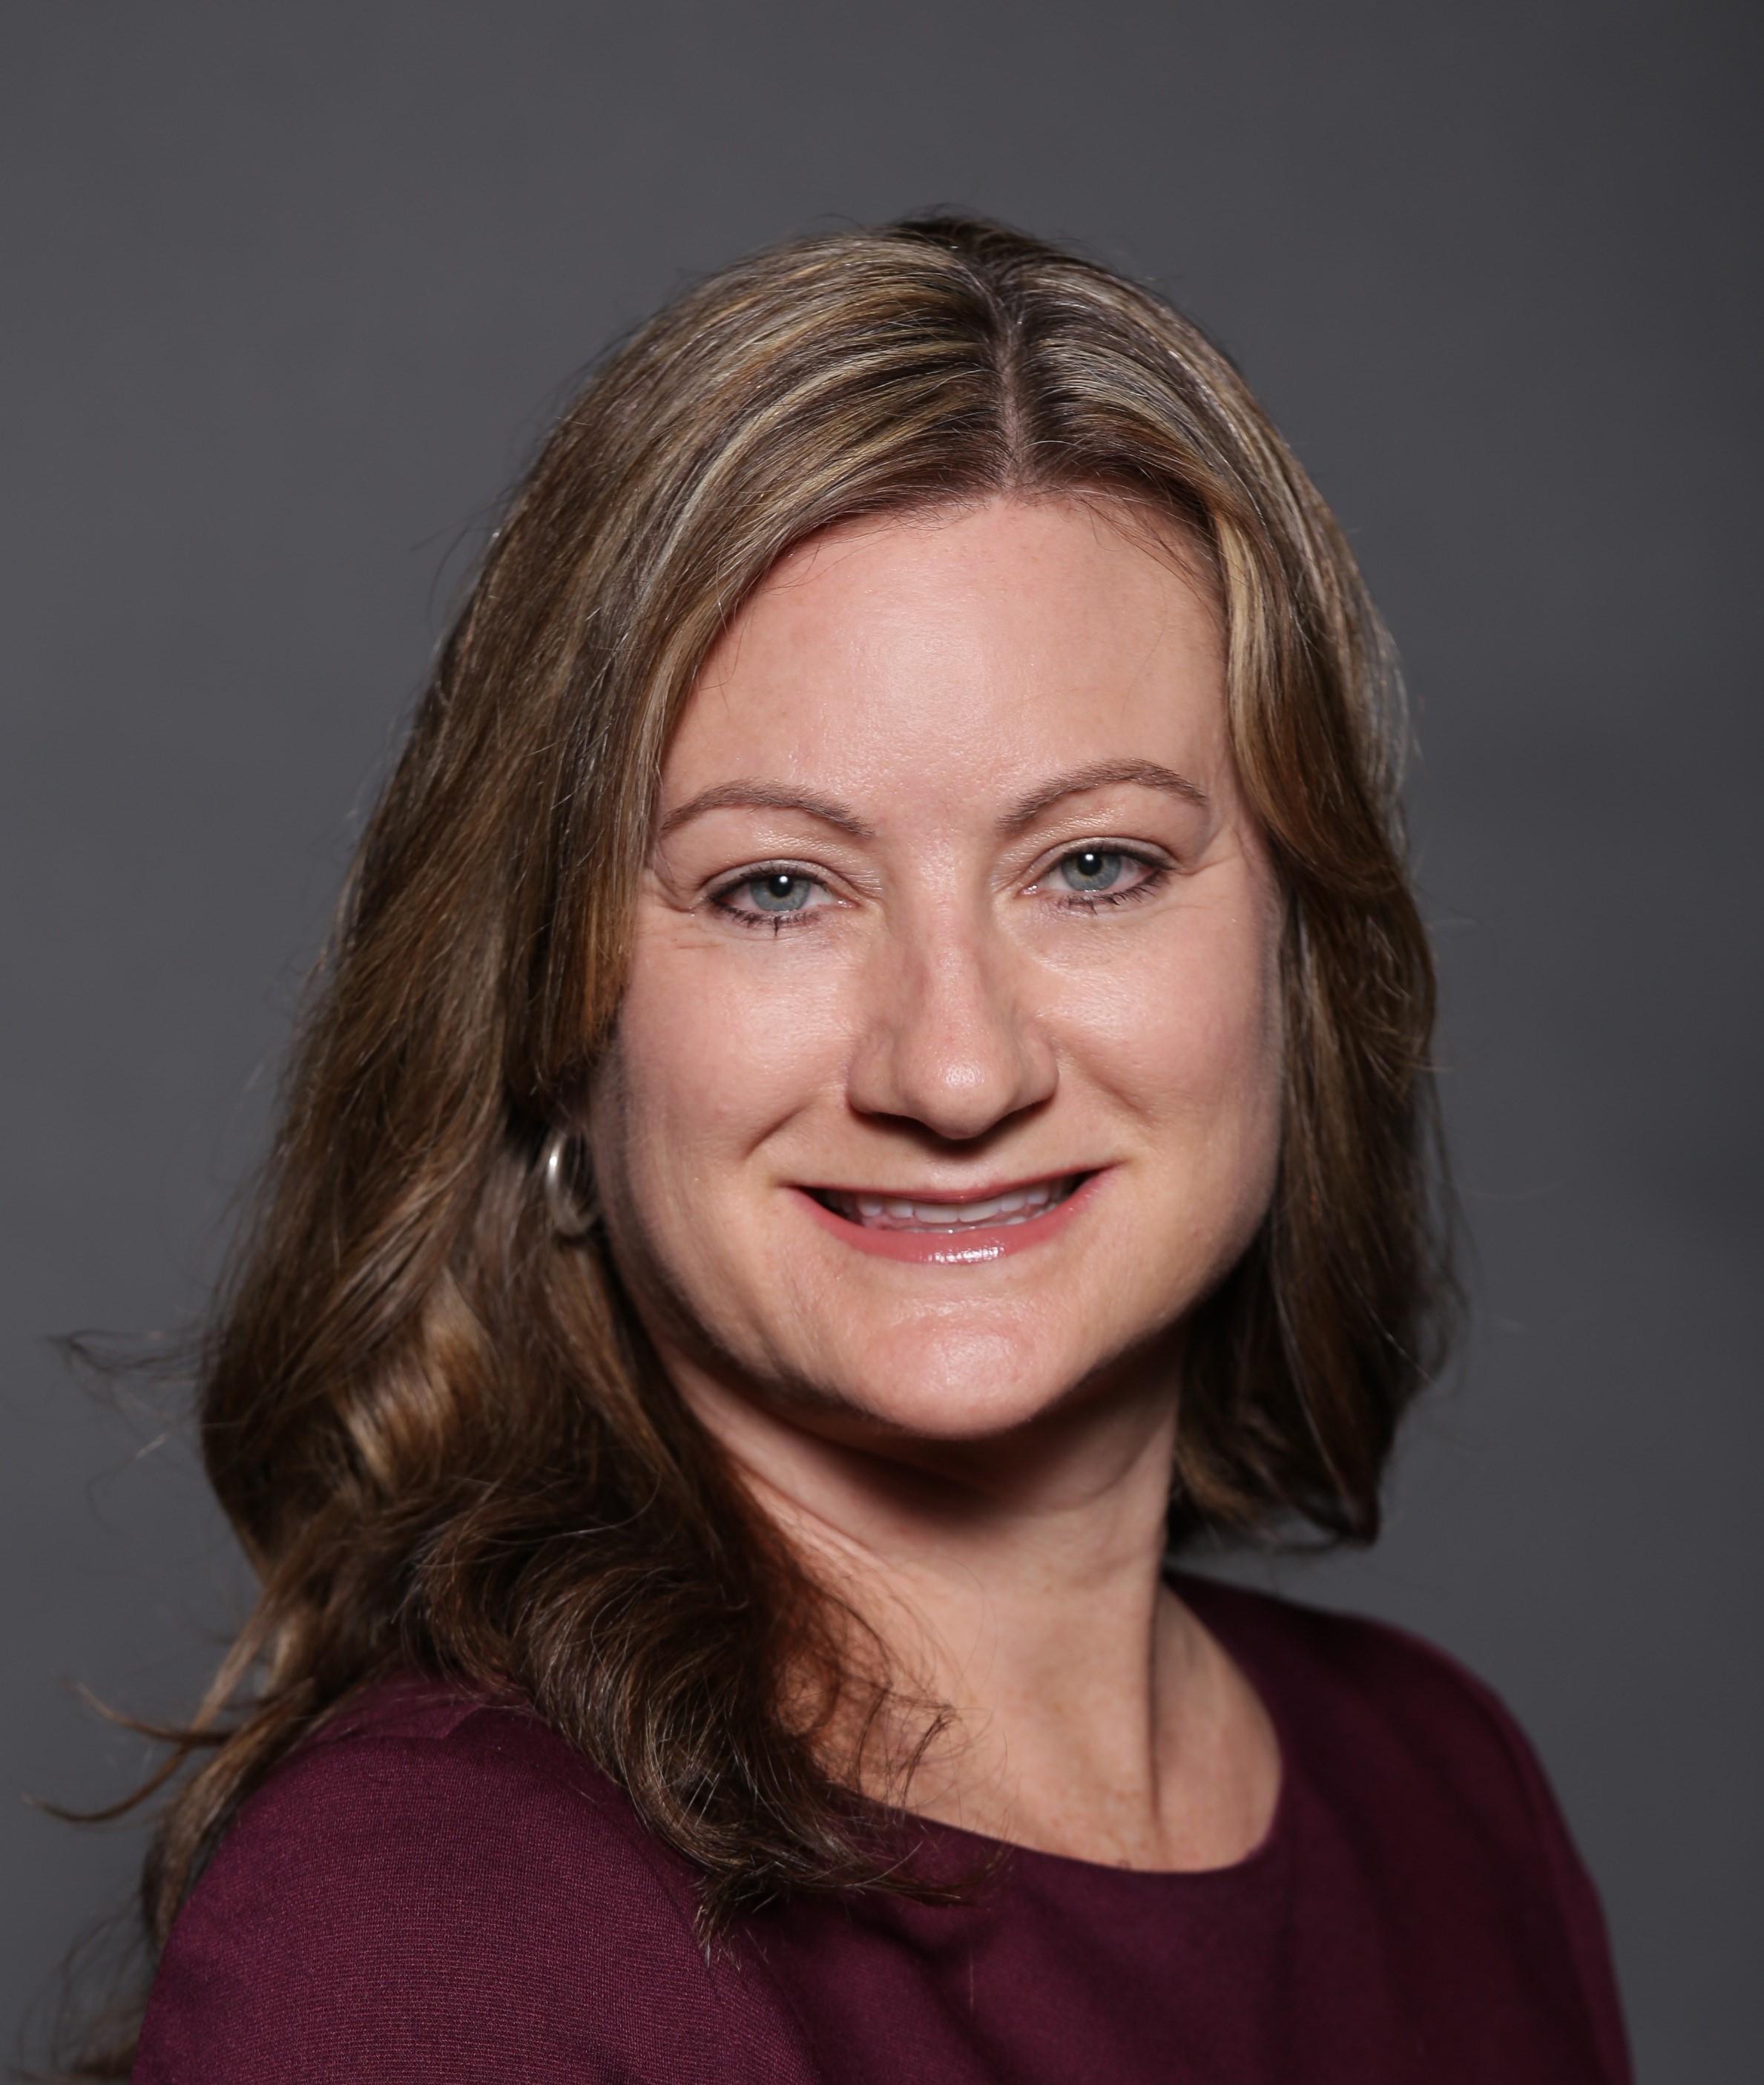 Image of Cynthia Gallee, JD, RHIA, CHC, Senior Solution Consultant